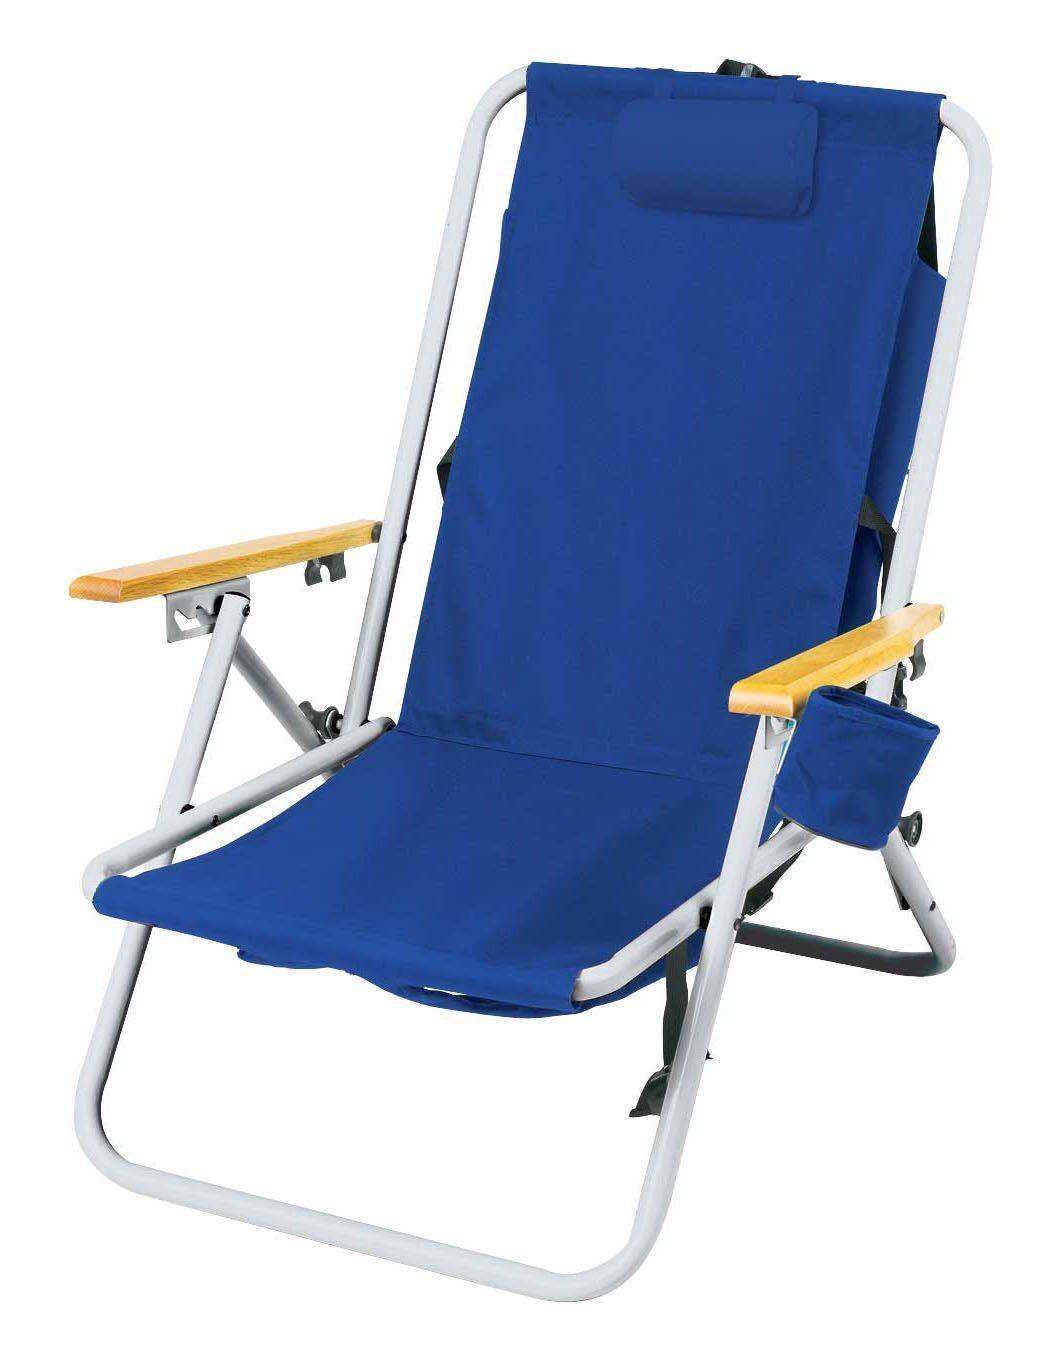 High back steel backpack beach chair by